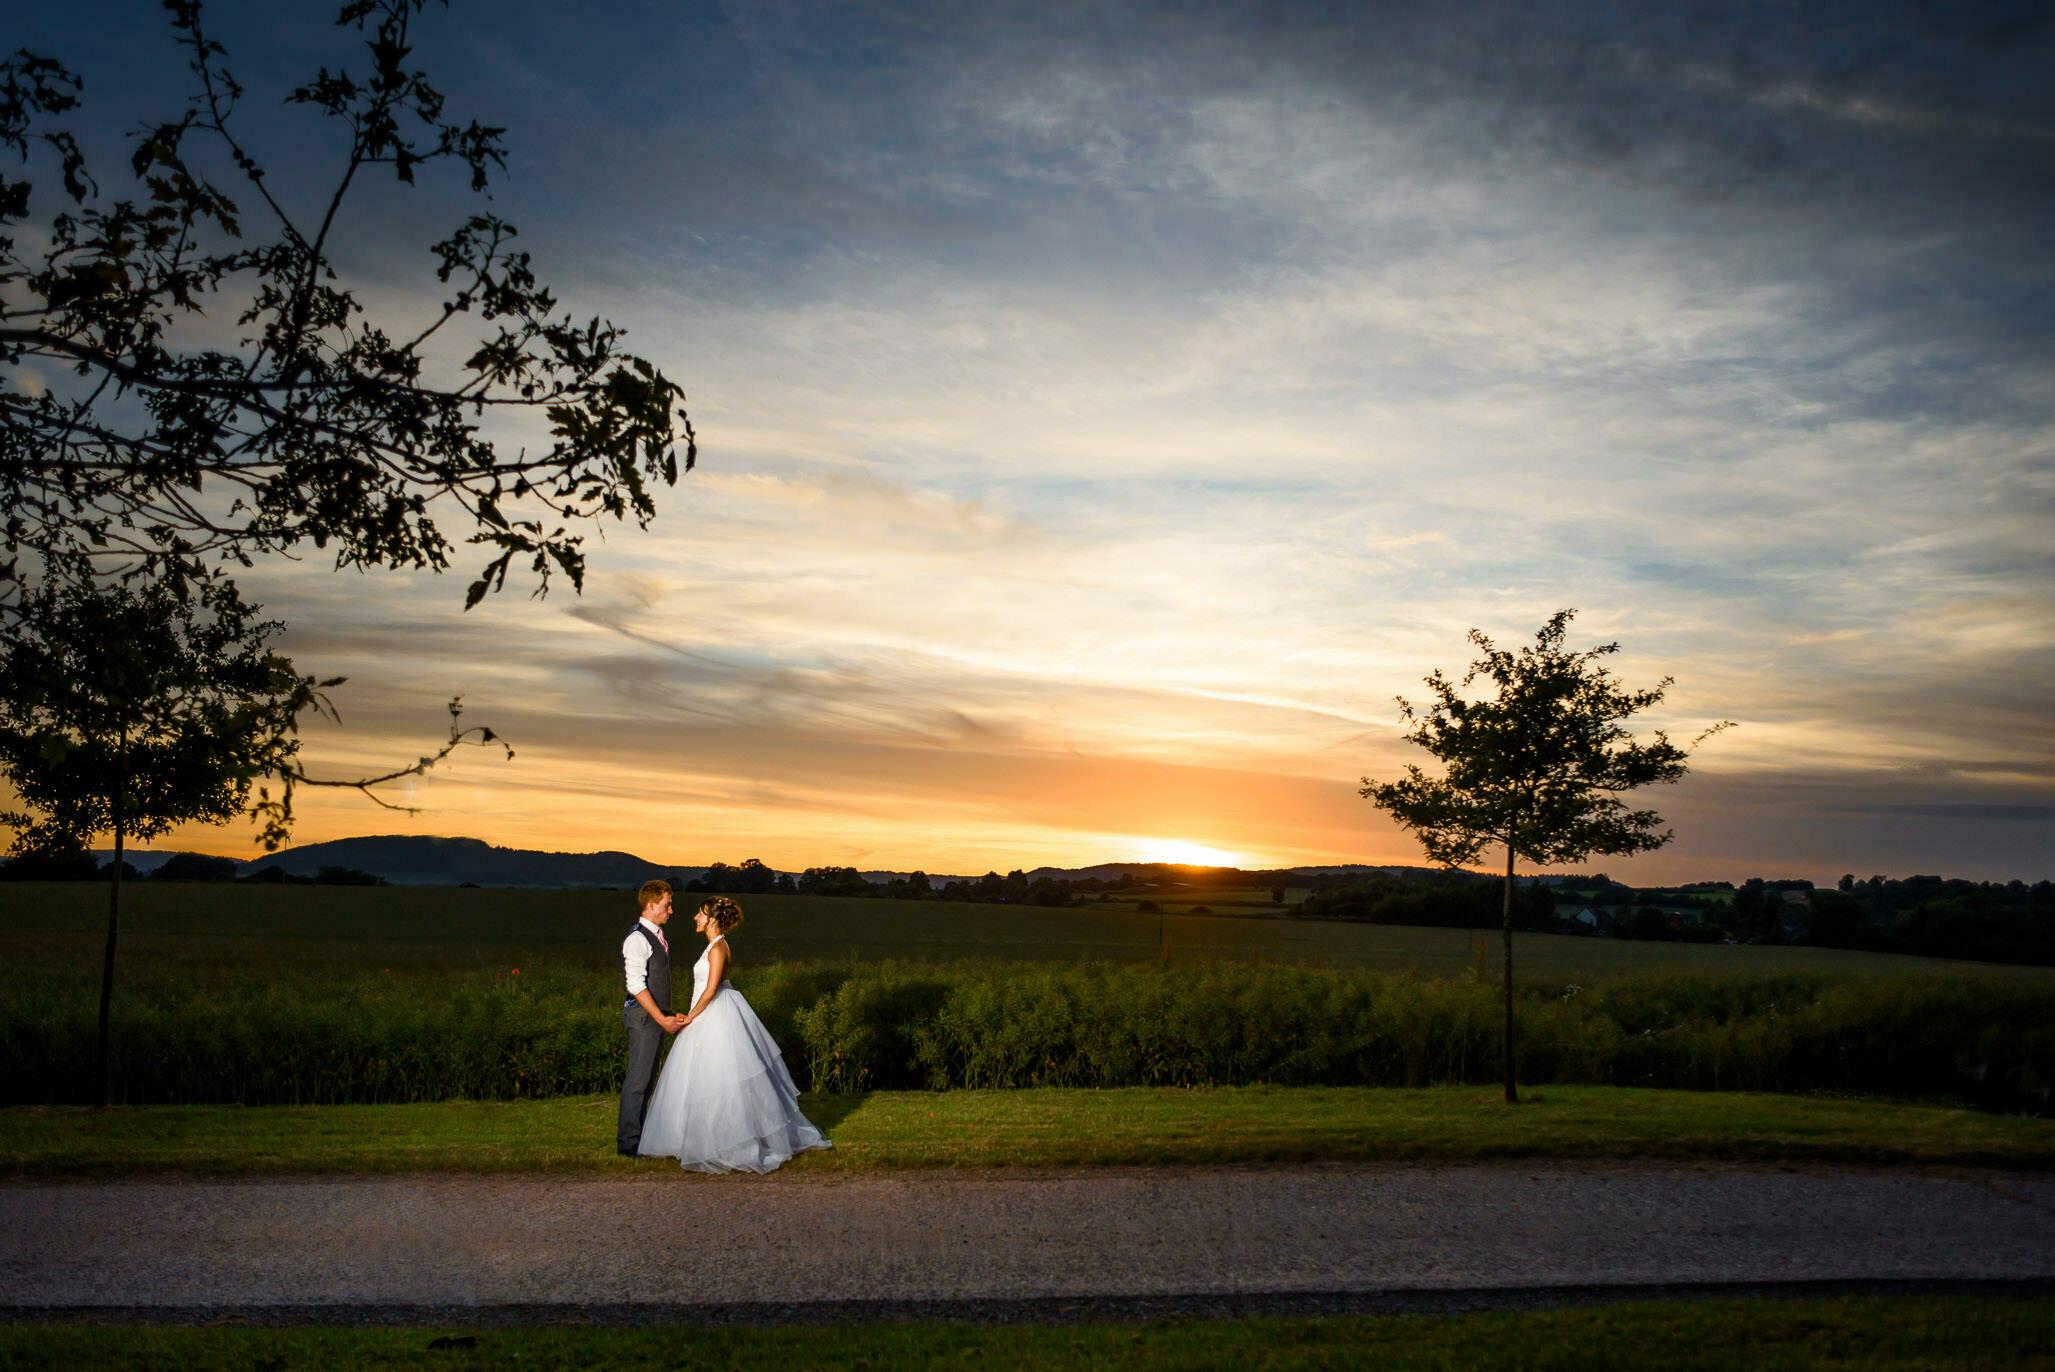 Wedding photo at Lyde Arundel